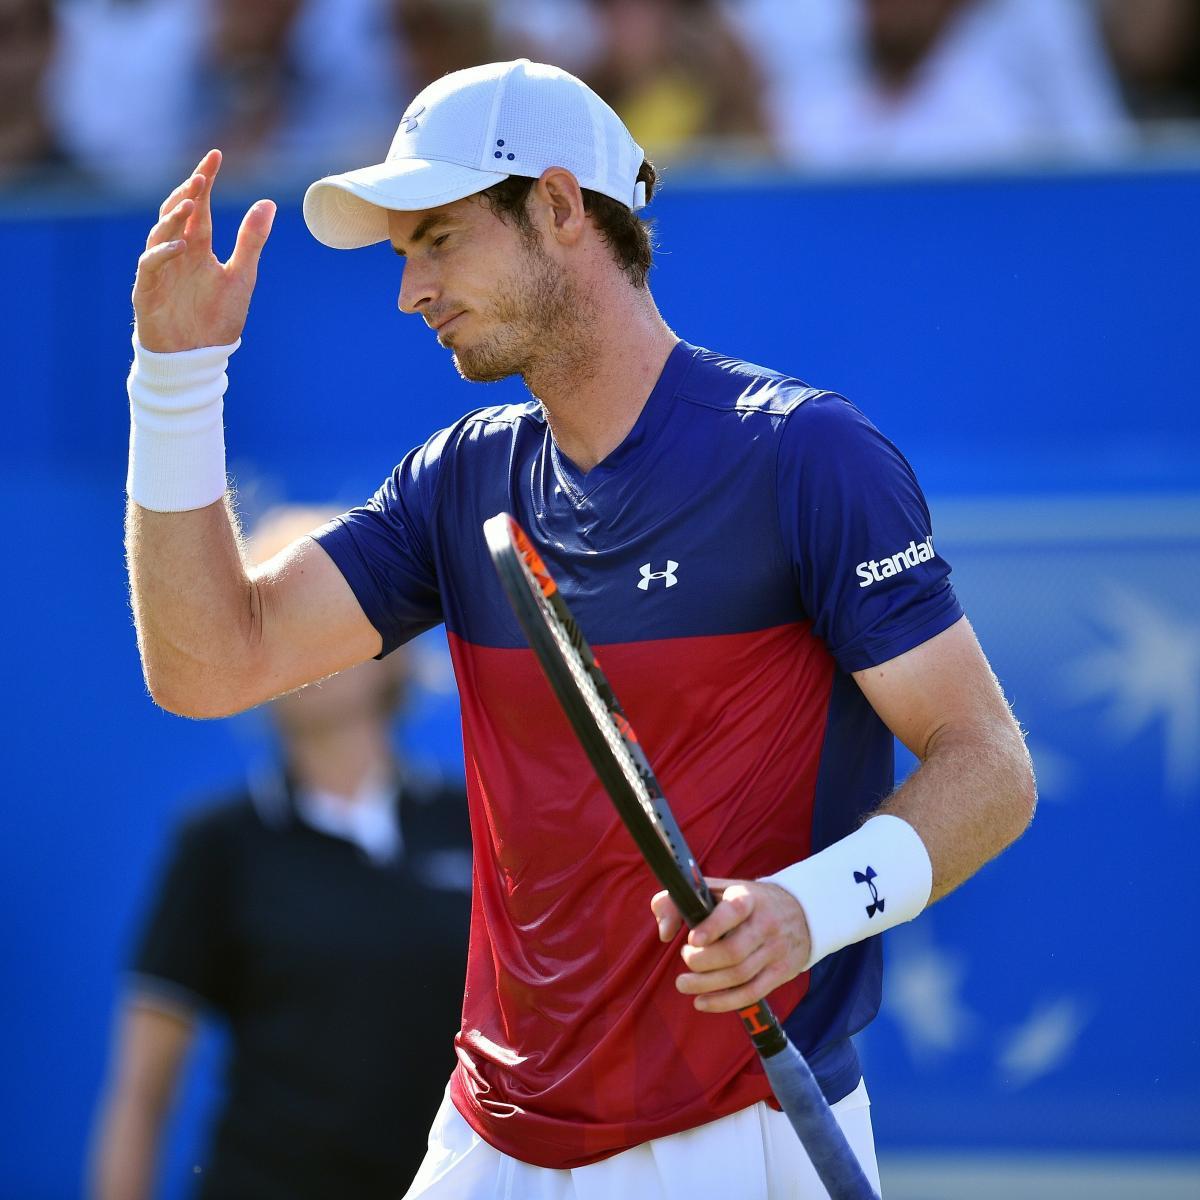 2017 Wimbledon Finals Brackets Back To The Future: Wimbledon 2017 Draw: Bracket, Schedule And Preview Of Men